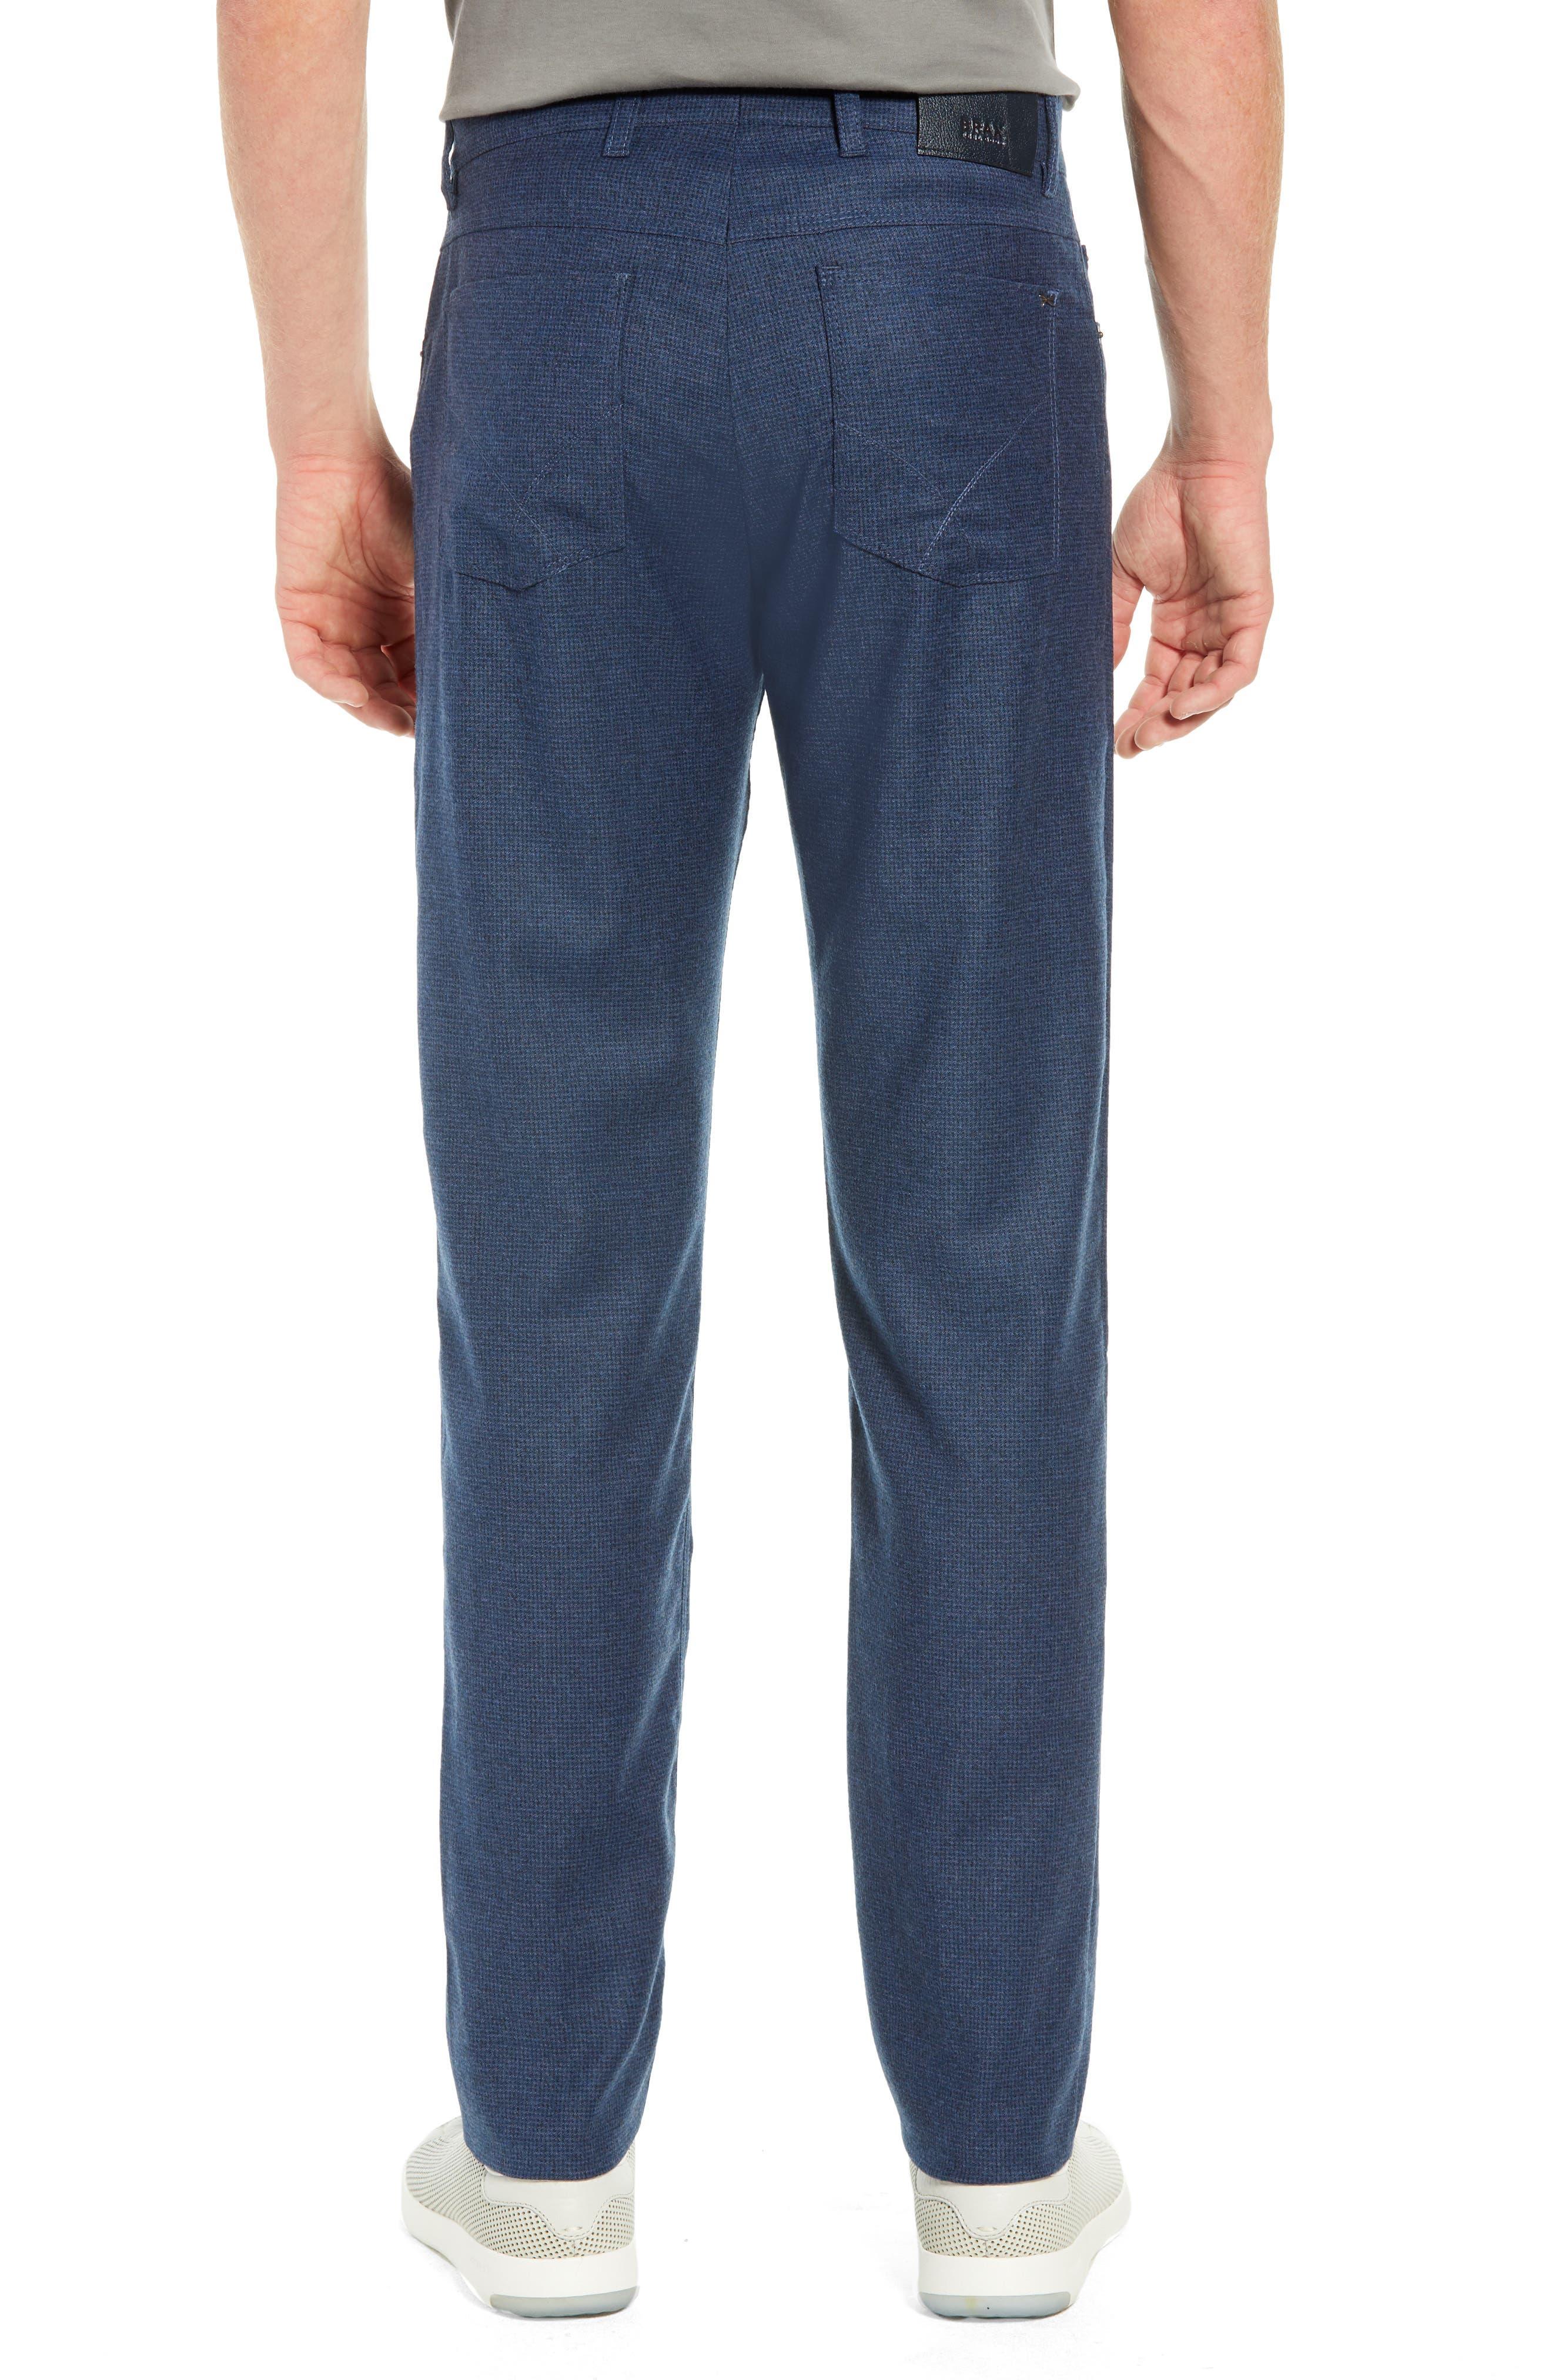 Cadiz Five-Pocket Stretch Wool Trousers,                             Alternate thumbnail 2, color,                             MIDNIGHT